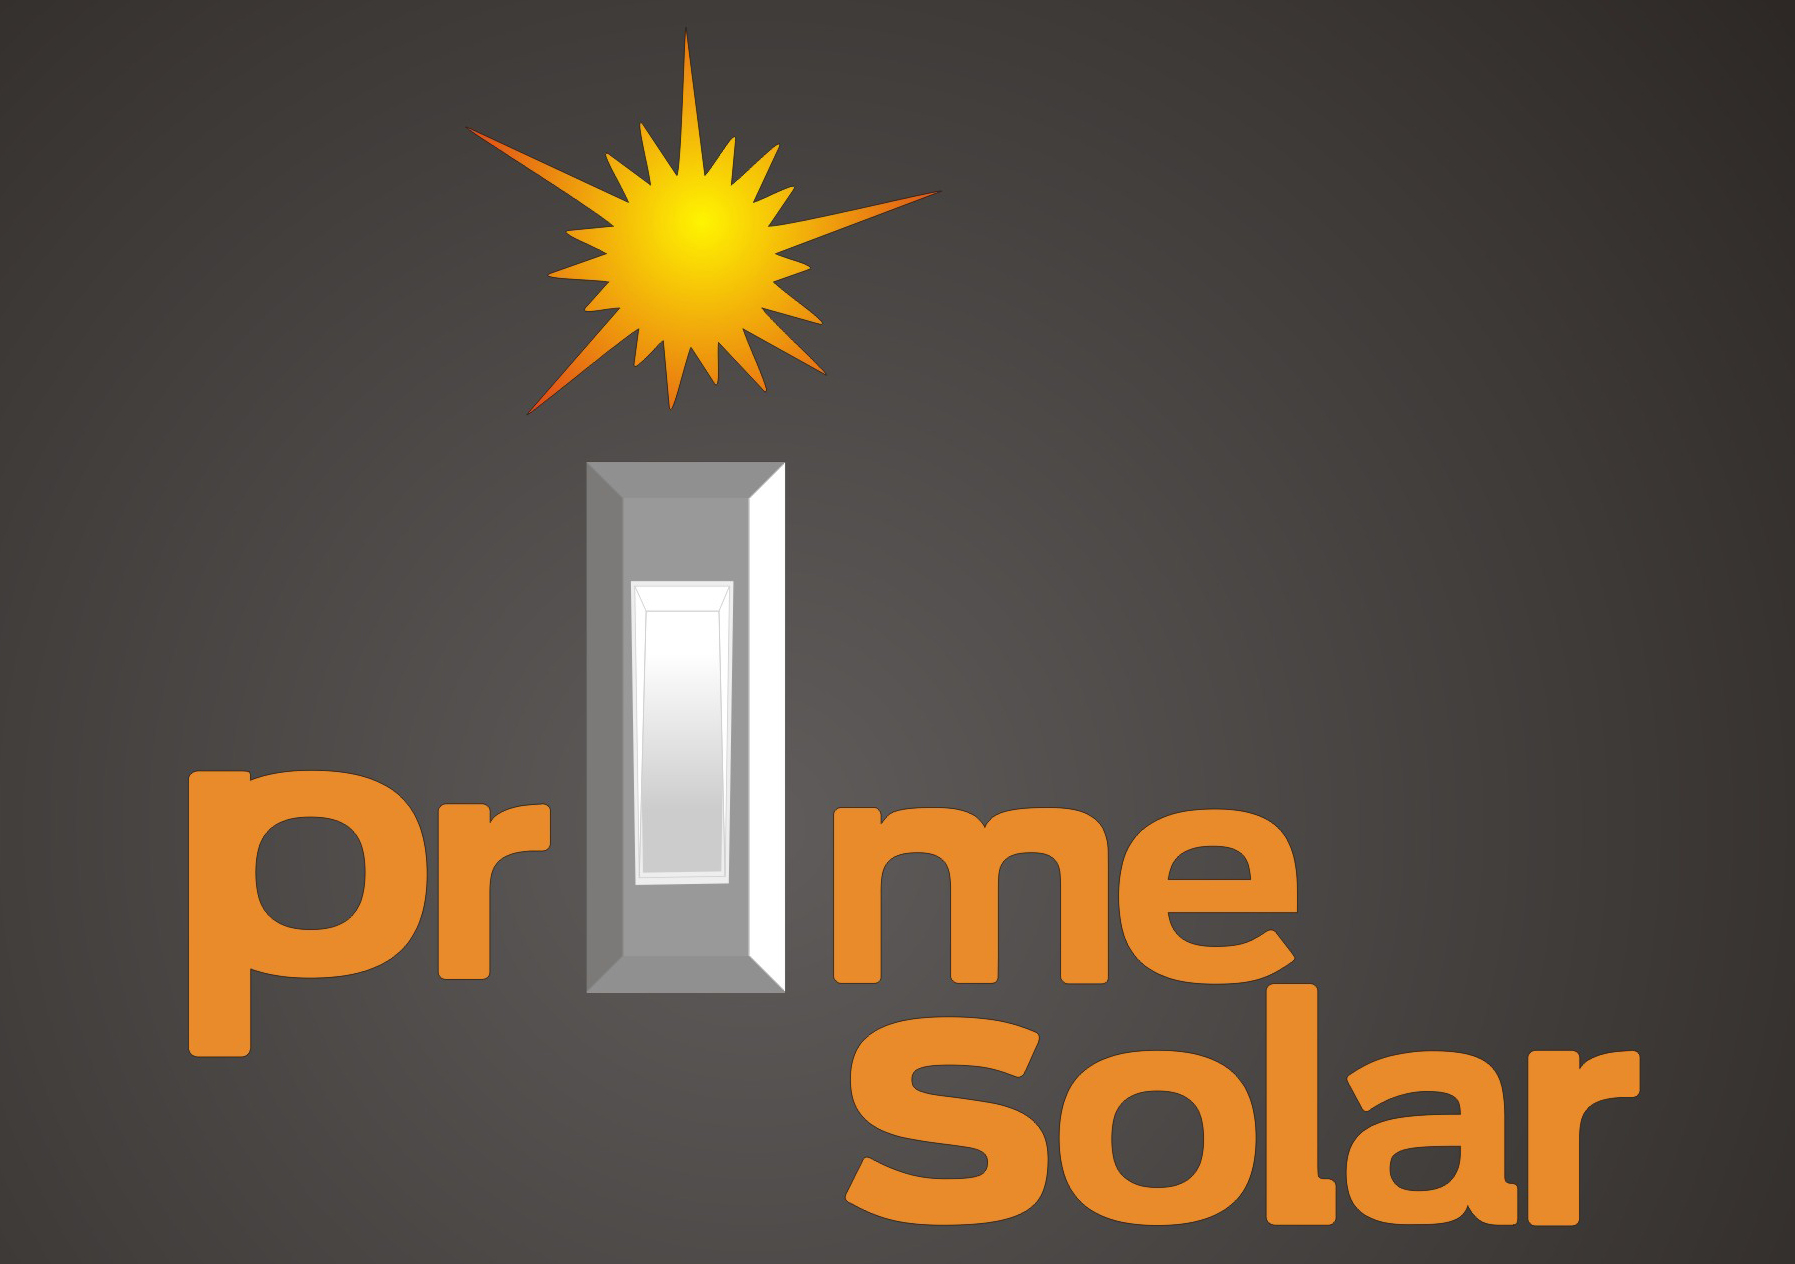 Логотип компании PrimeSolar [UPD: 16:45 15/12/11] фото f_4ef1ed8213aed.jpg